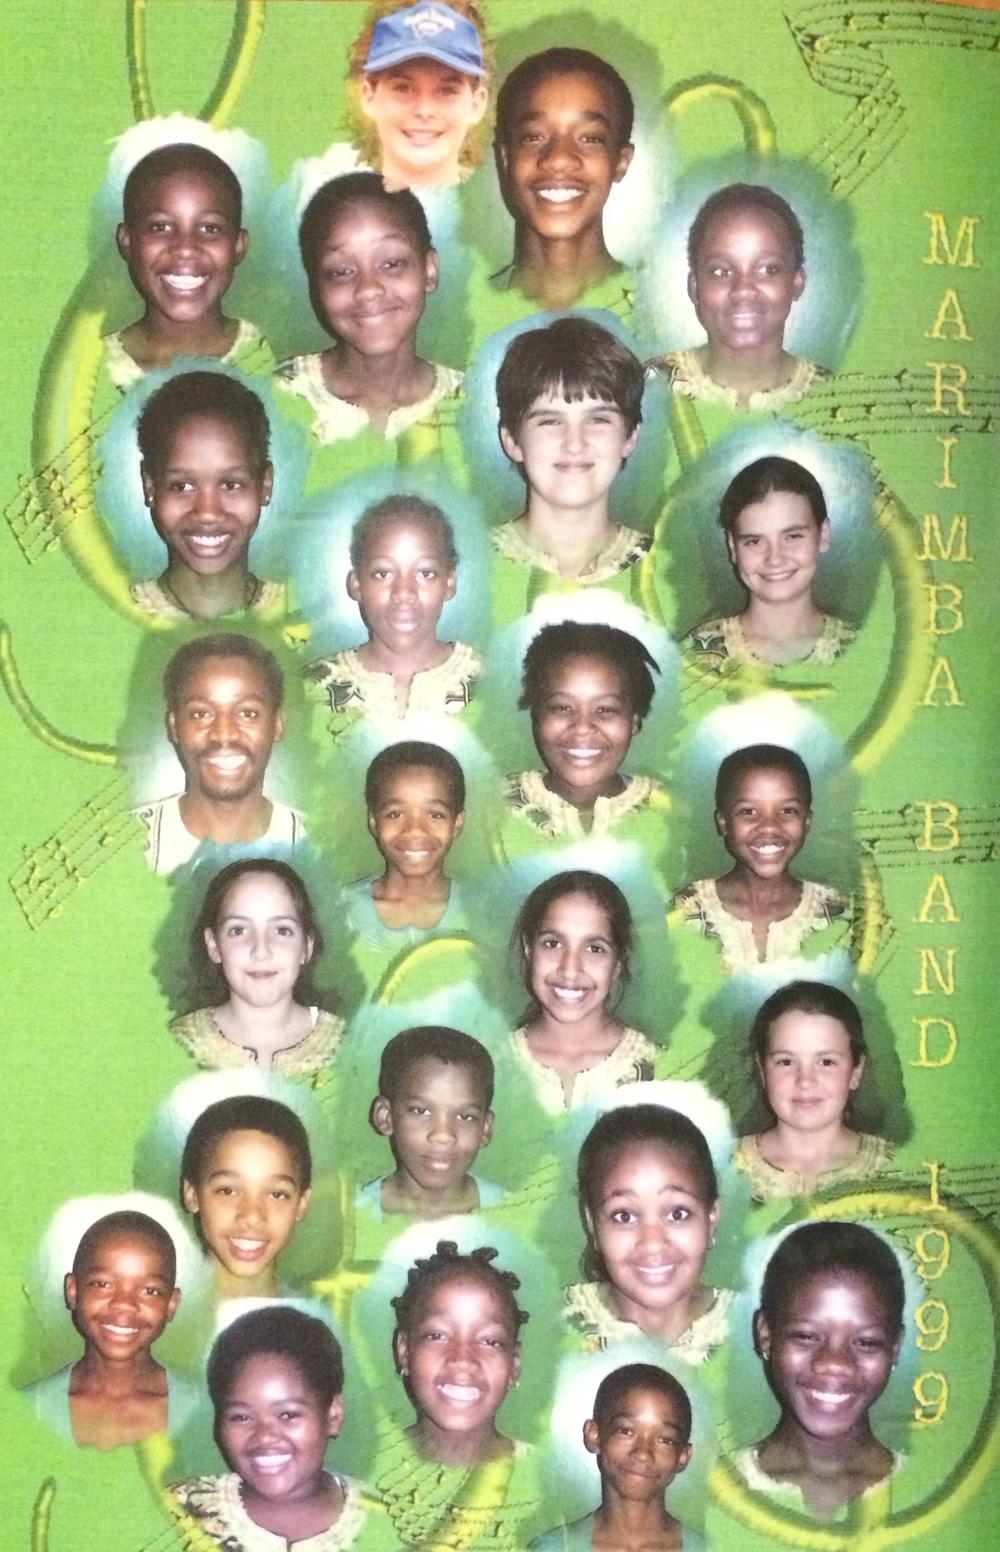 Thornhill Marimba Band, 1999. (From top left to bottom right, vertically: Yvette, Lame, Michael Sibanda, Lilliana, Otto, Setso, Tshepiso, Amy, Among, Sharon, Seele, Boikanyo, Charlotte, Kealeboga, Careen, Keletso, Jaanki, Mogi, Karabo, Thamani, Amber, Lenitame, Sara, Sakhile)